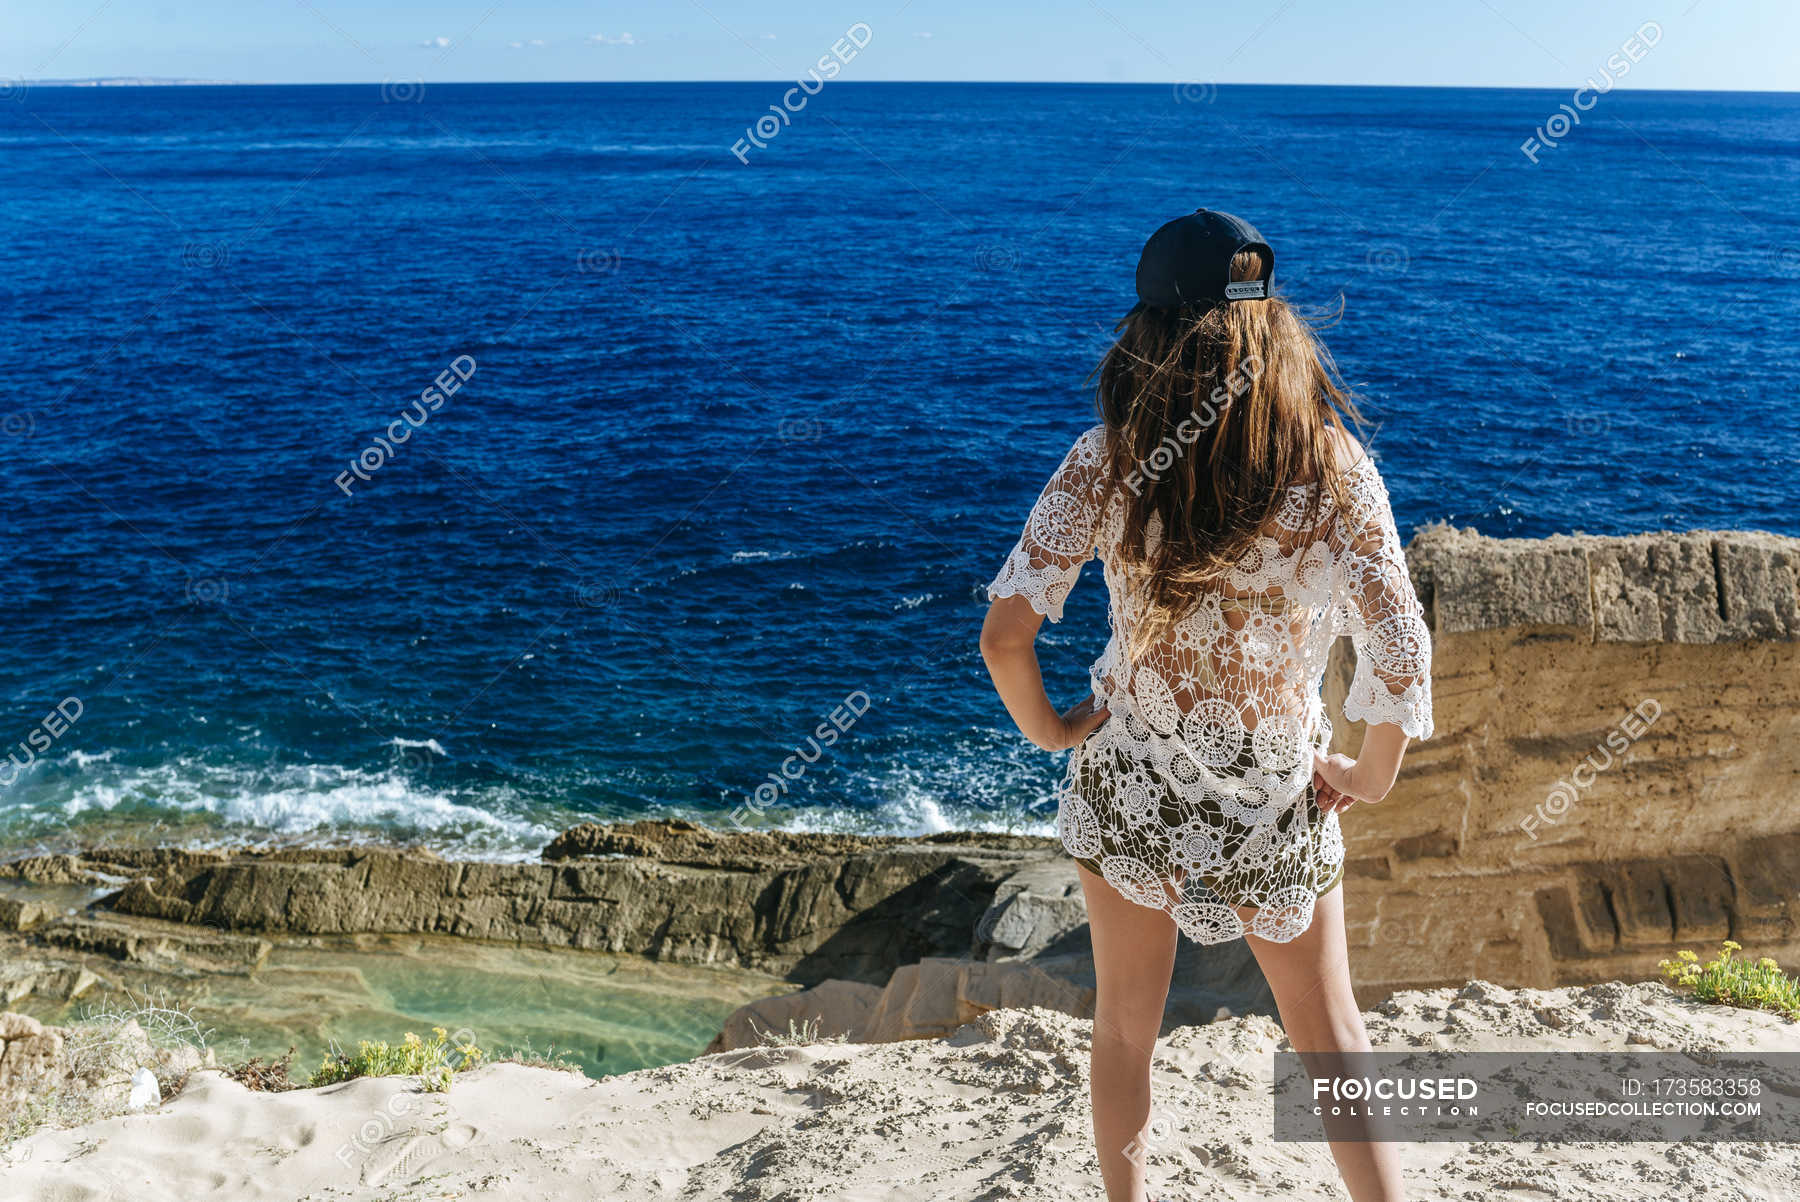 Frauen Am Meer Bilder